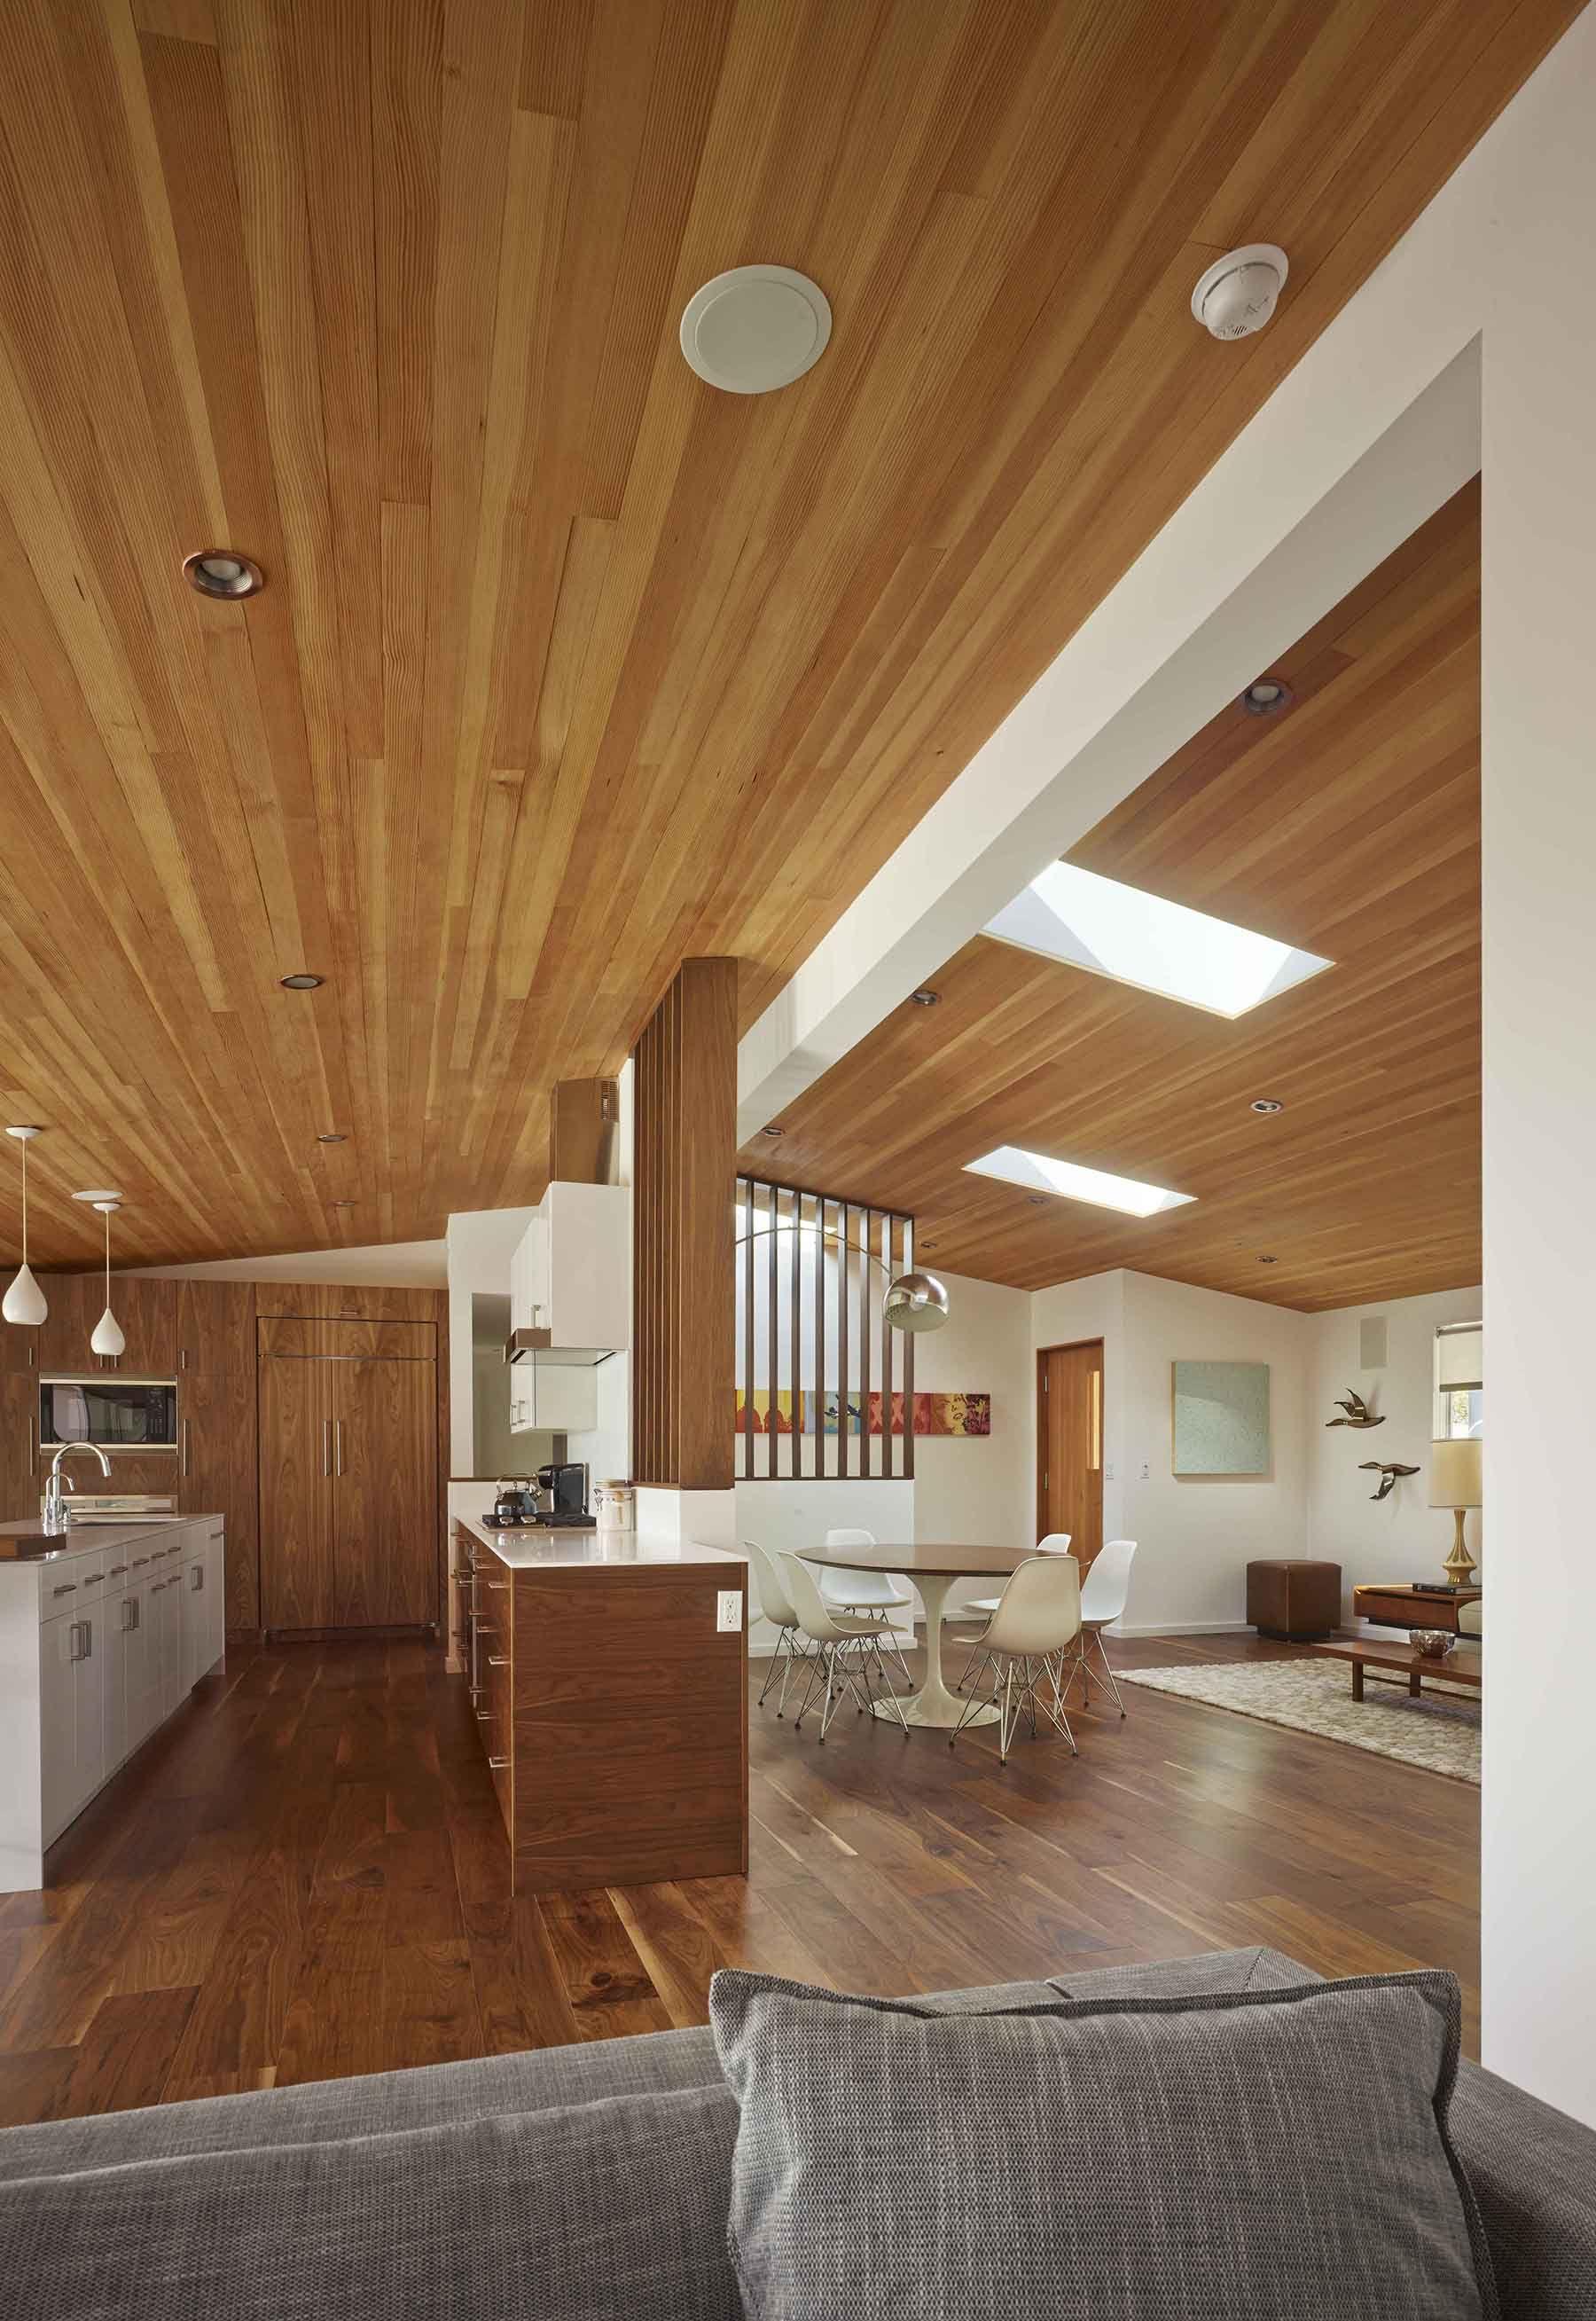 Ikea Kitchen With Semihandmade Flatsawn Walnut Fronts Custom Cabinet Doors House Ikea Kitchen